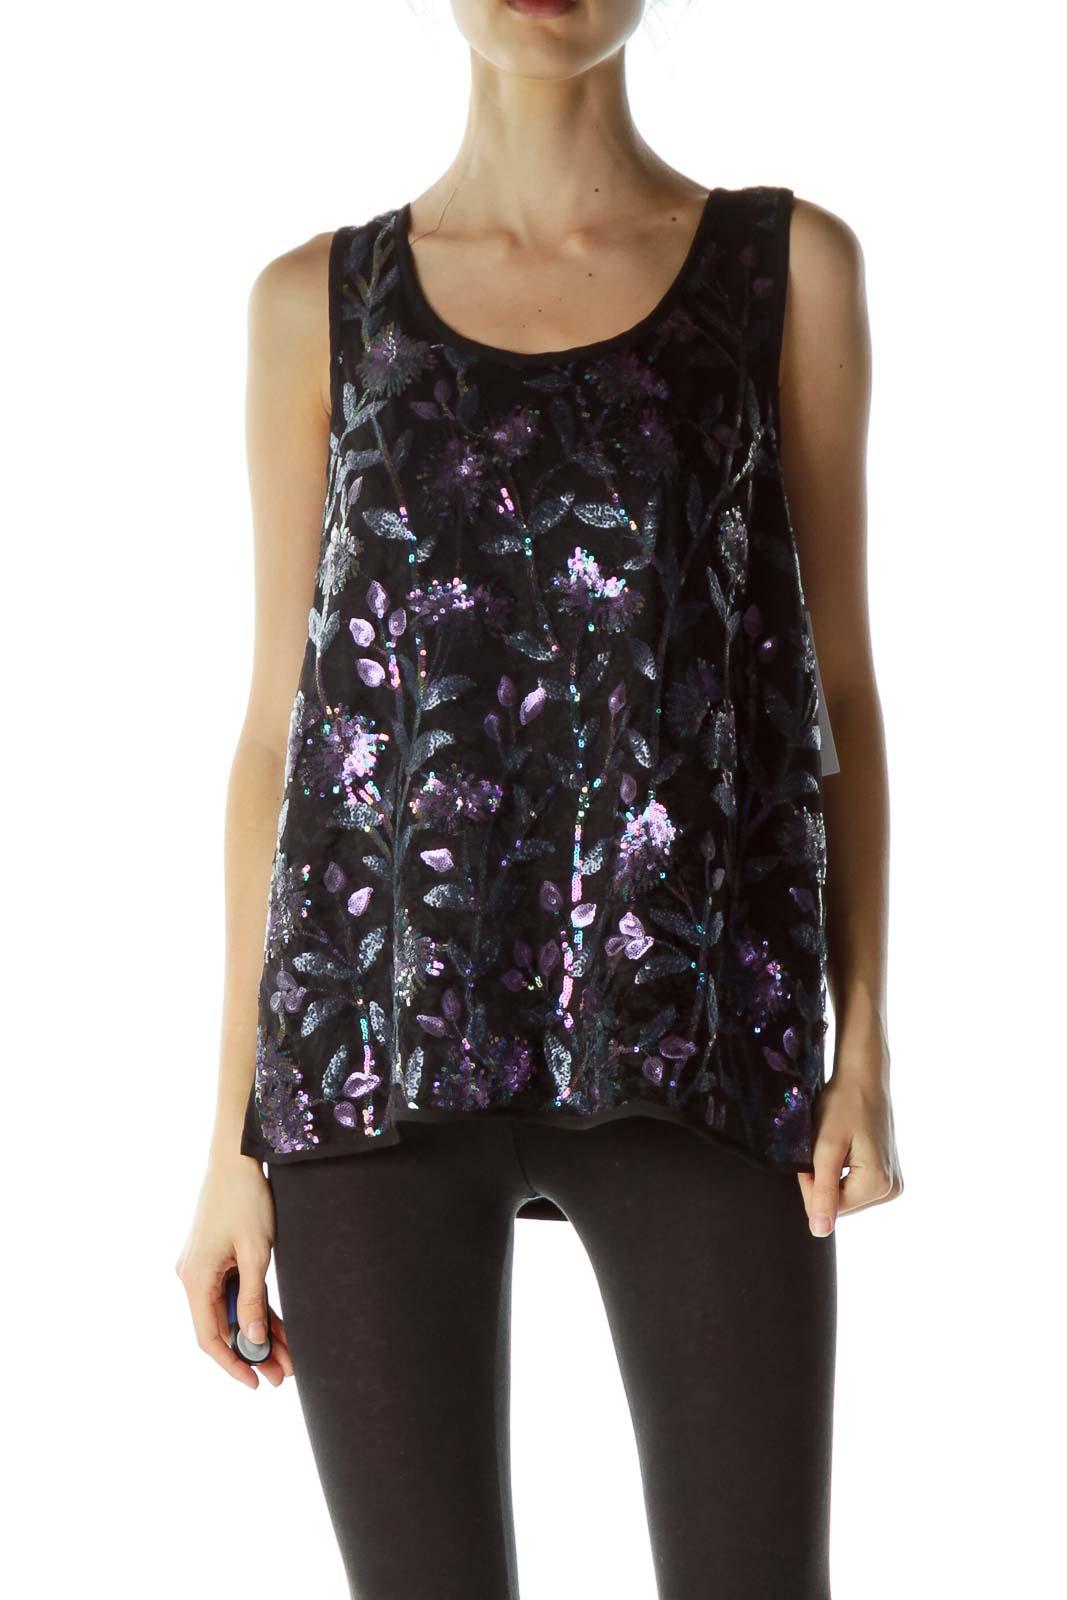 Black Purple Floral Sequins Sleeveless Blouse